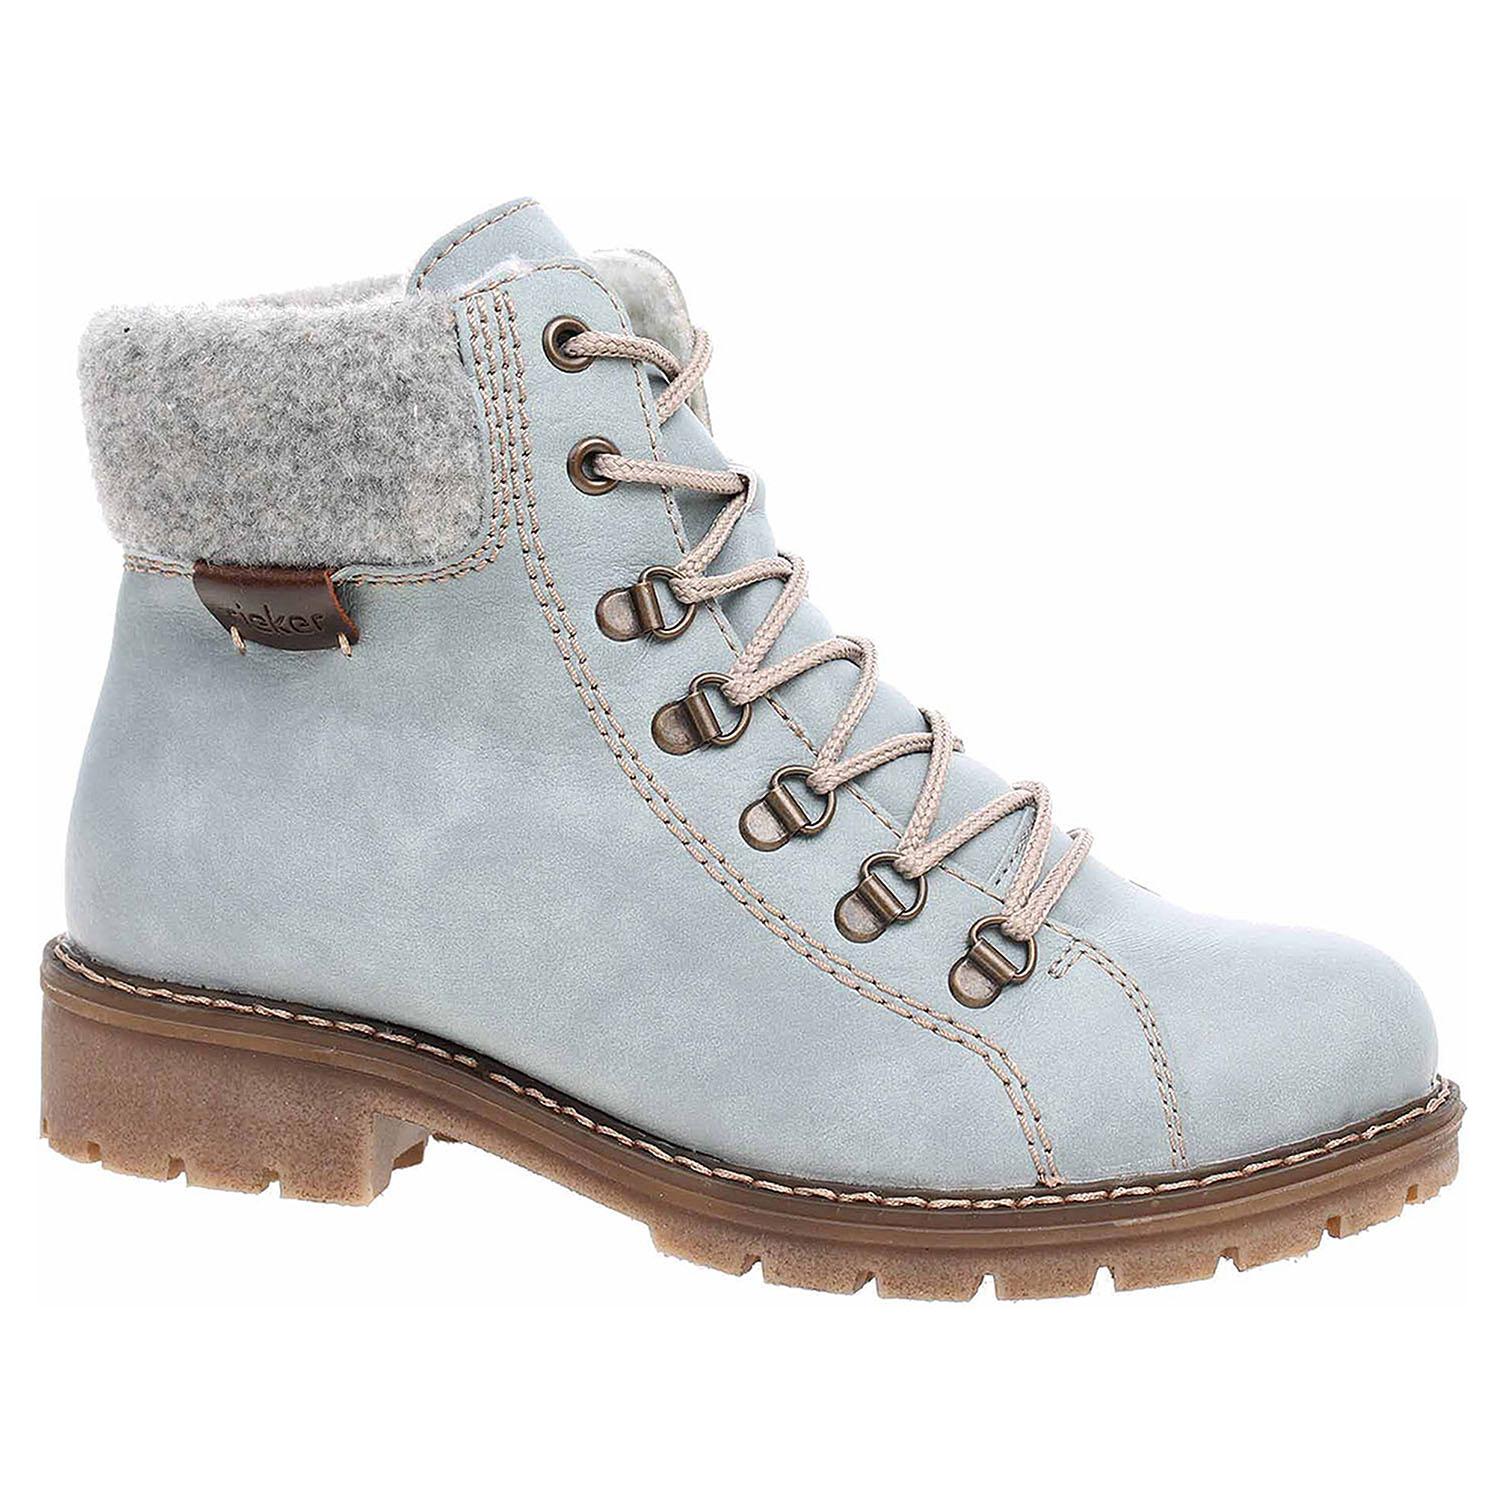 Dámská kotníková obuv Rieker Y9142-10 blau Y9142-10 41